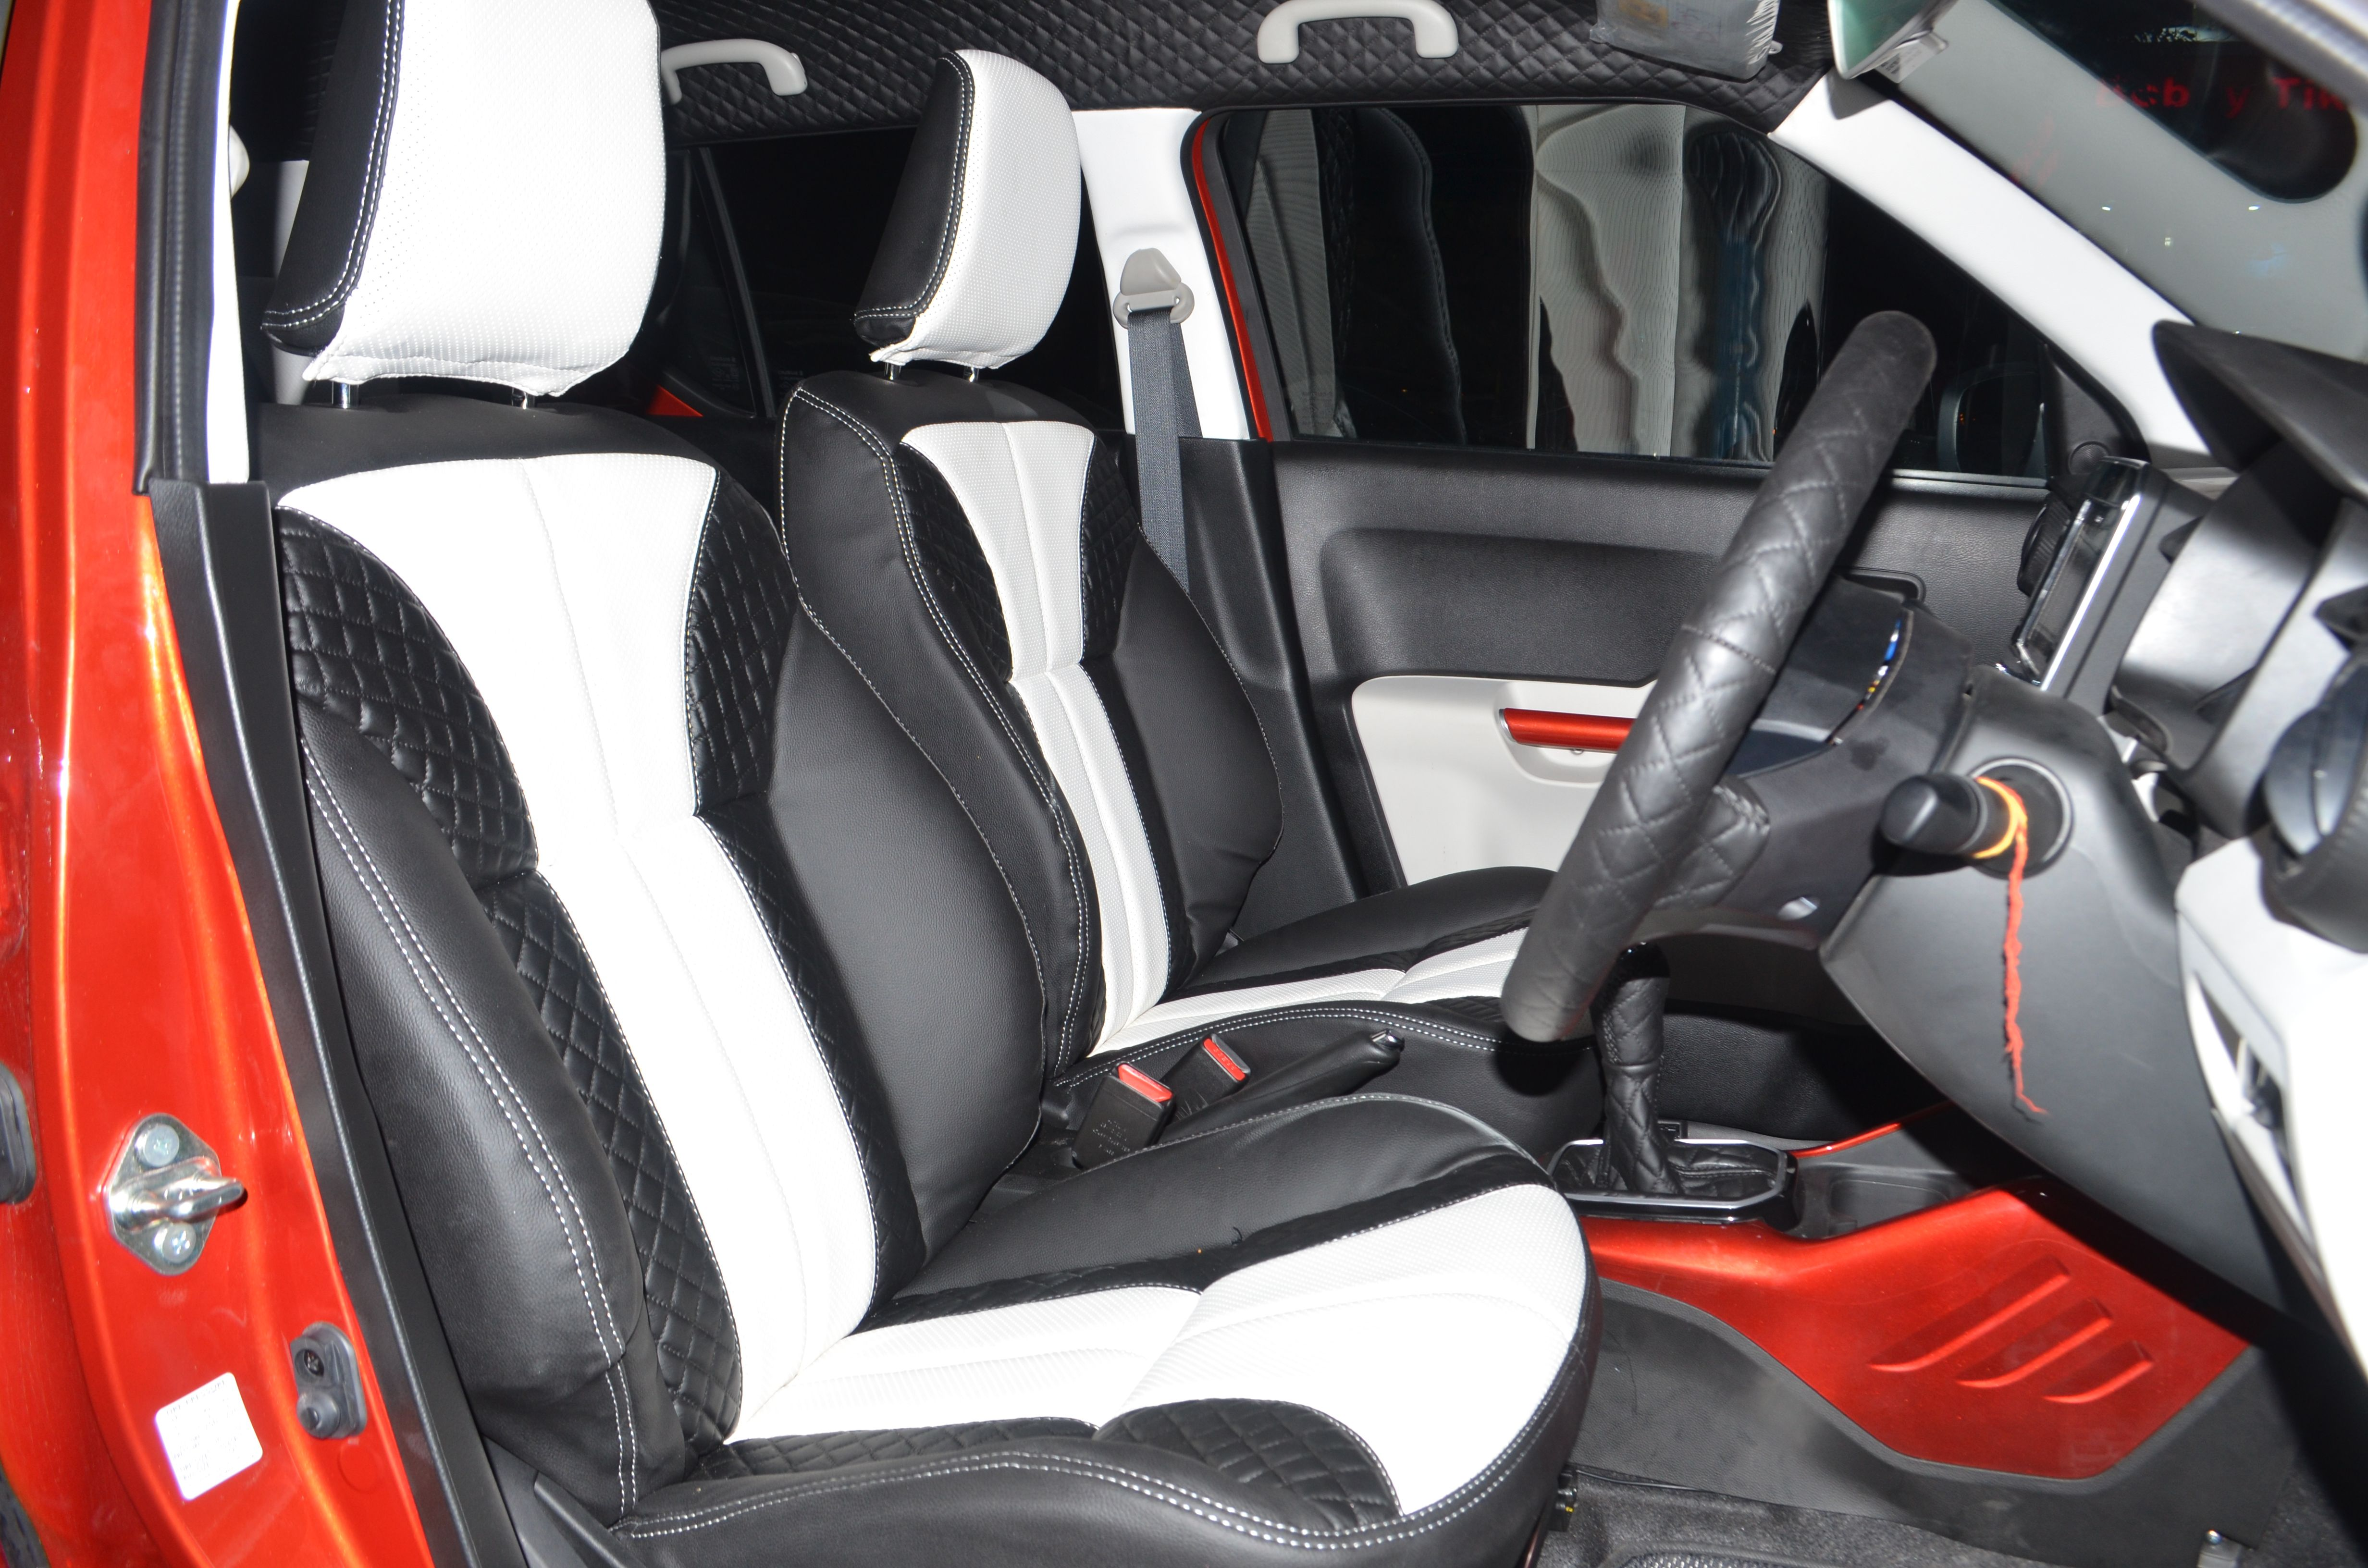 #Car_Interior_Accessories For #MarutiSuzuki #Ignis Get best offers and discount on Interior